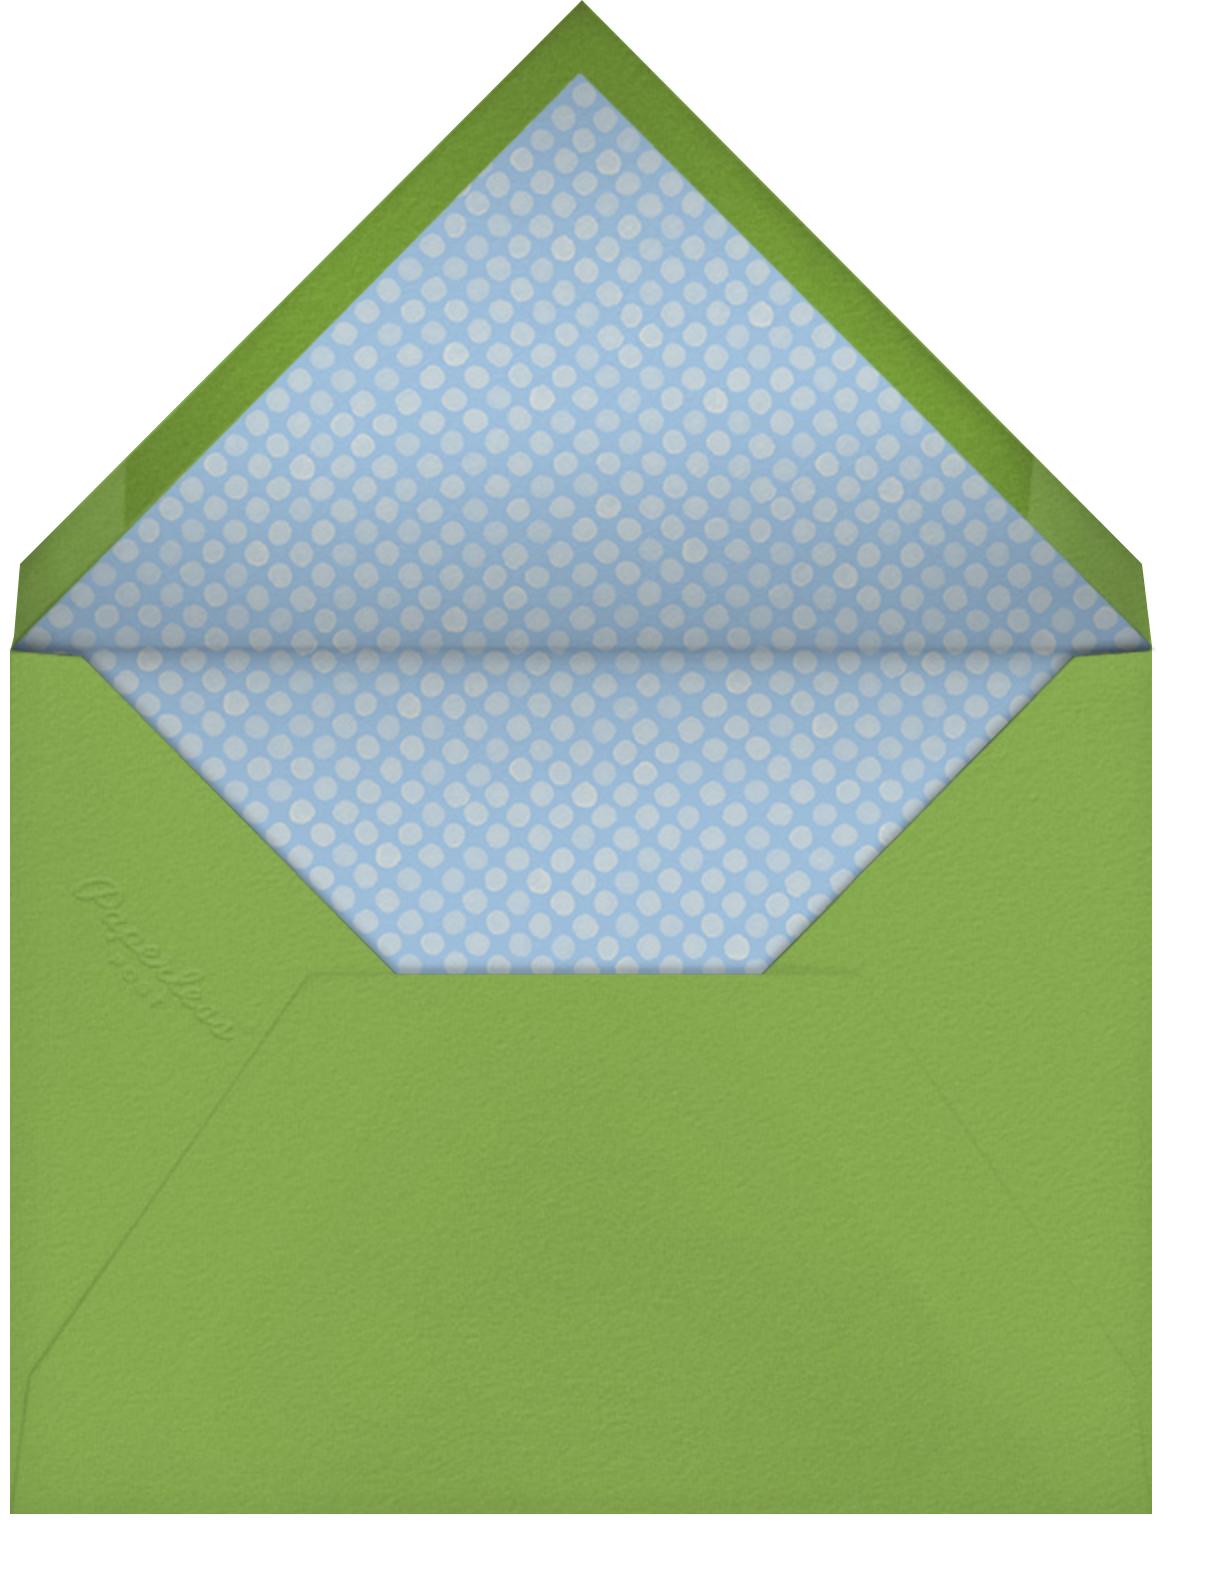 Snowdrop - Paperless Post - Bridal shower - envelope back